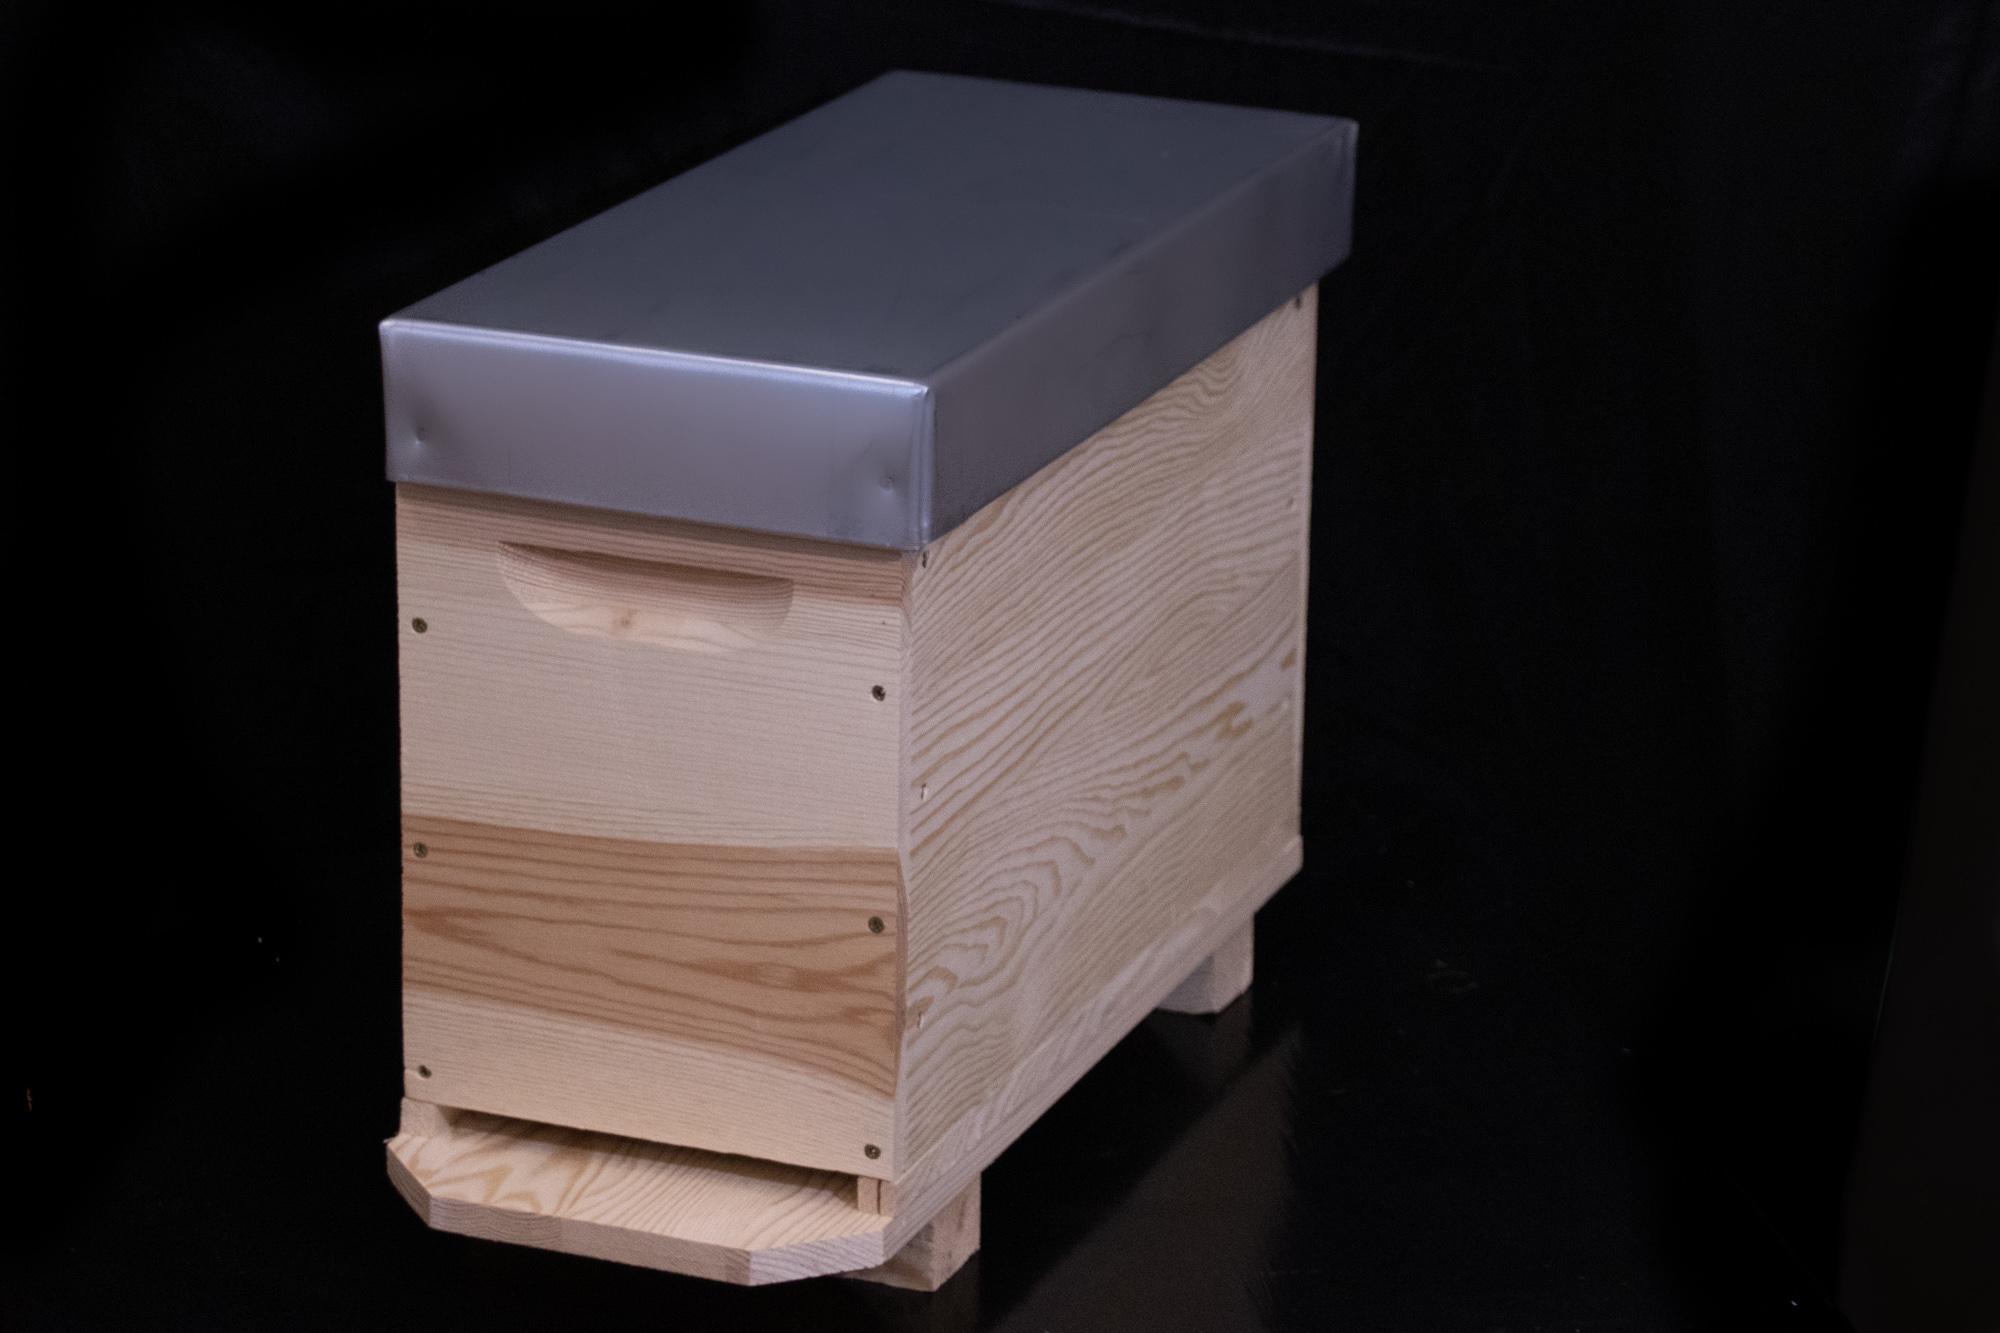 Ruchettes en bois, ruchettes en polystyrène, ruchettes vitrée, ruchettes carton